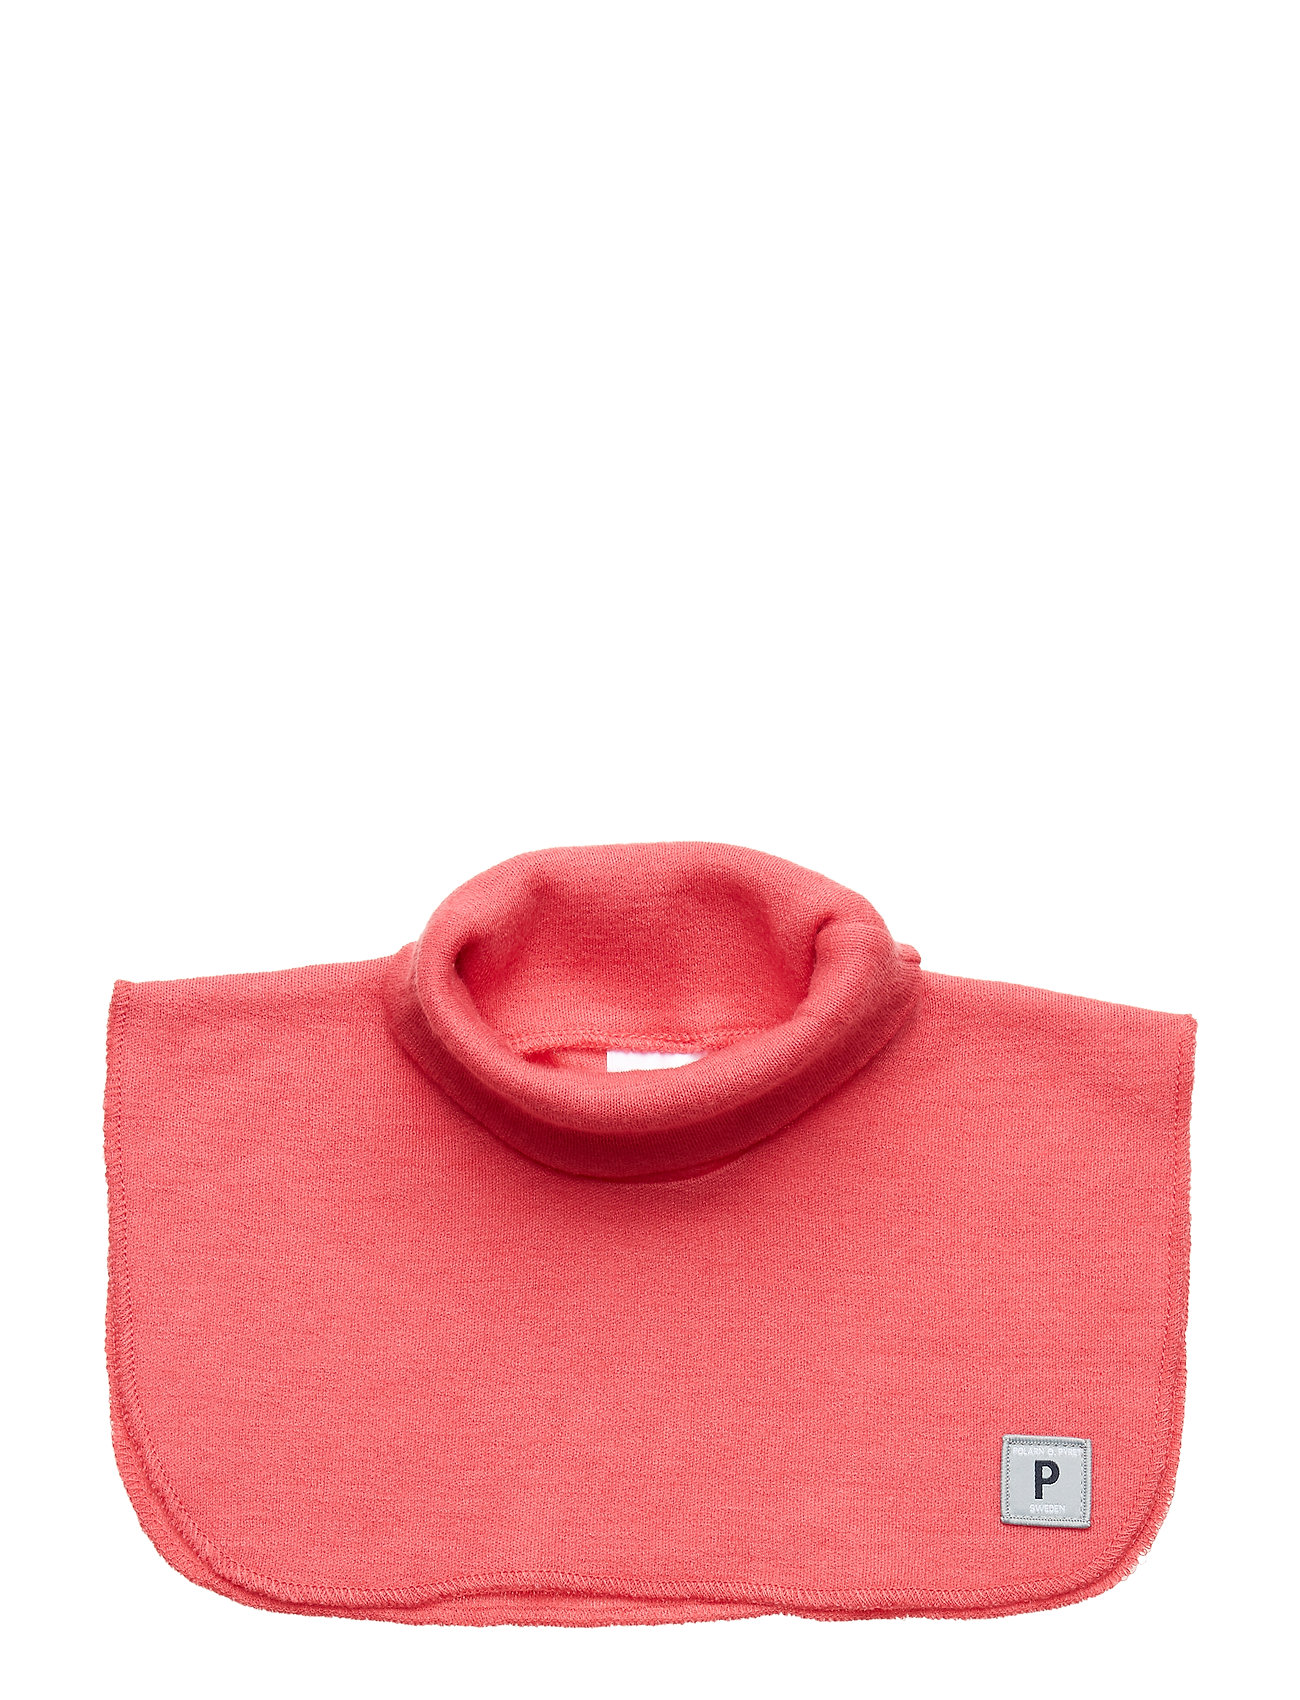 Polarn O. Pyret Neckwarmer Wool Solid preschool - FRUIT DOVE